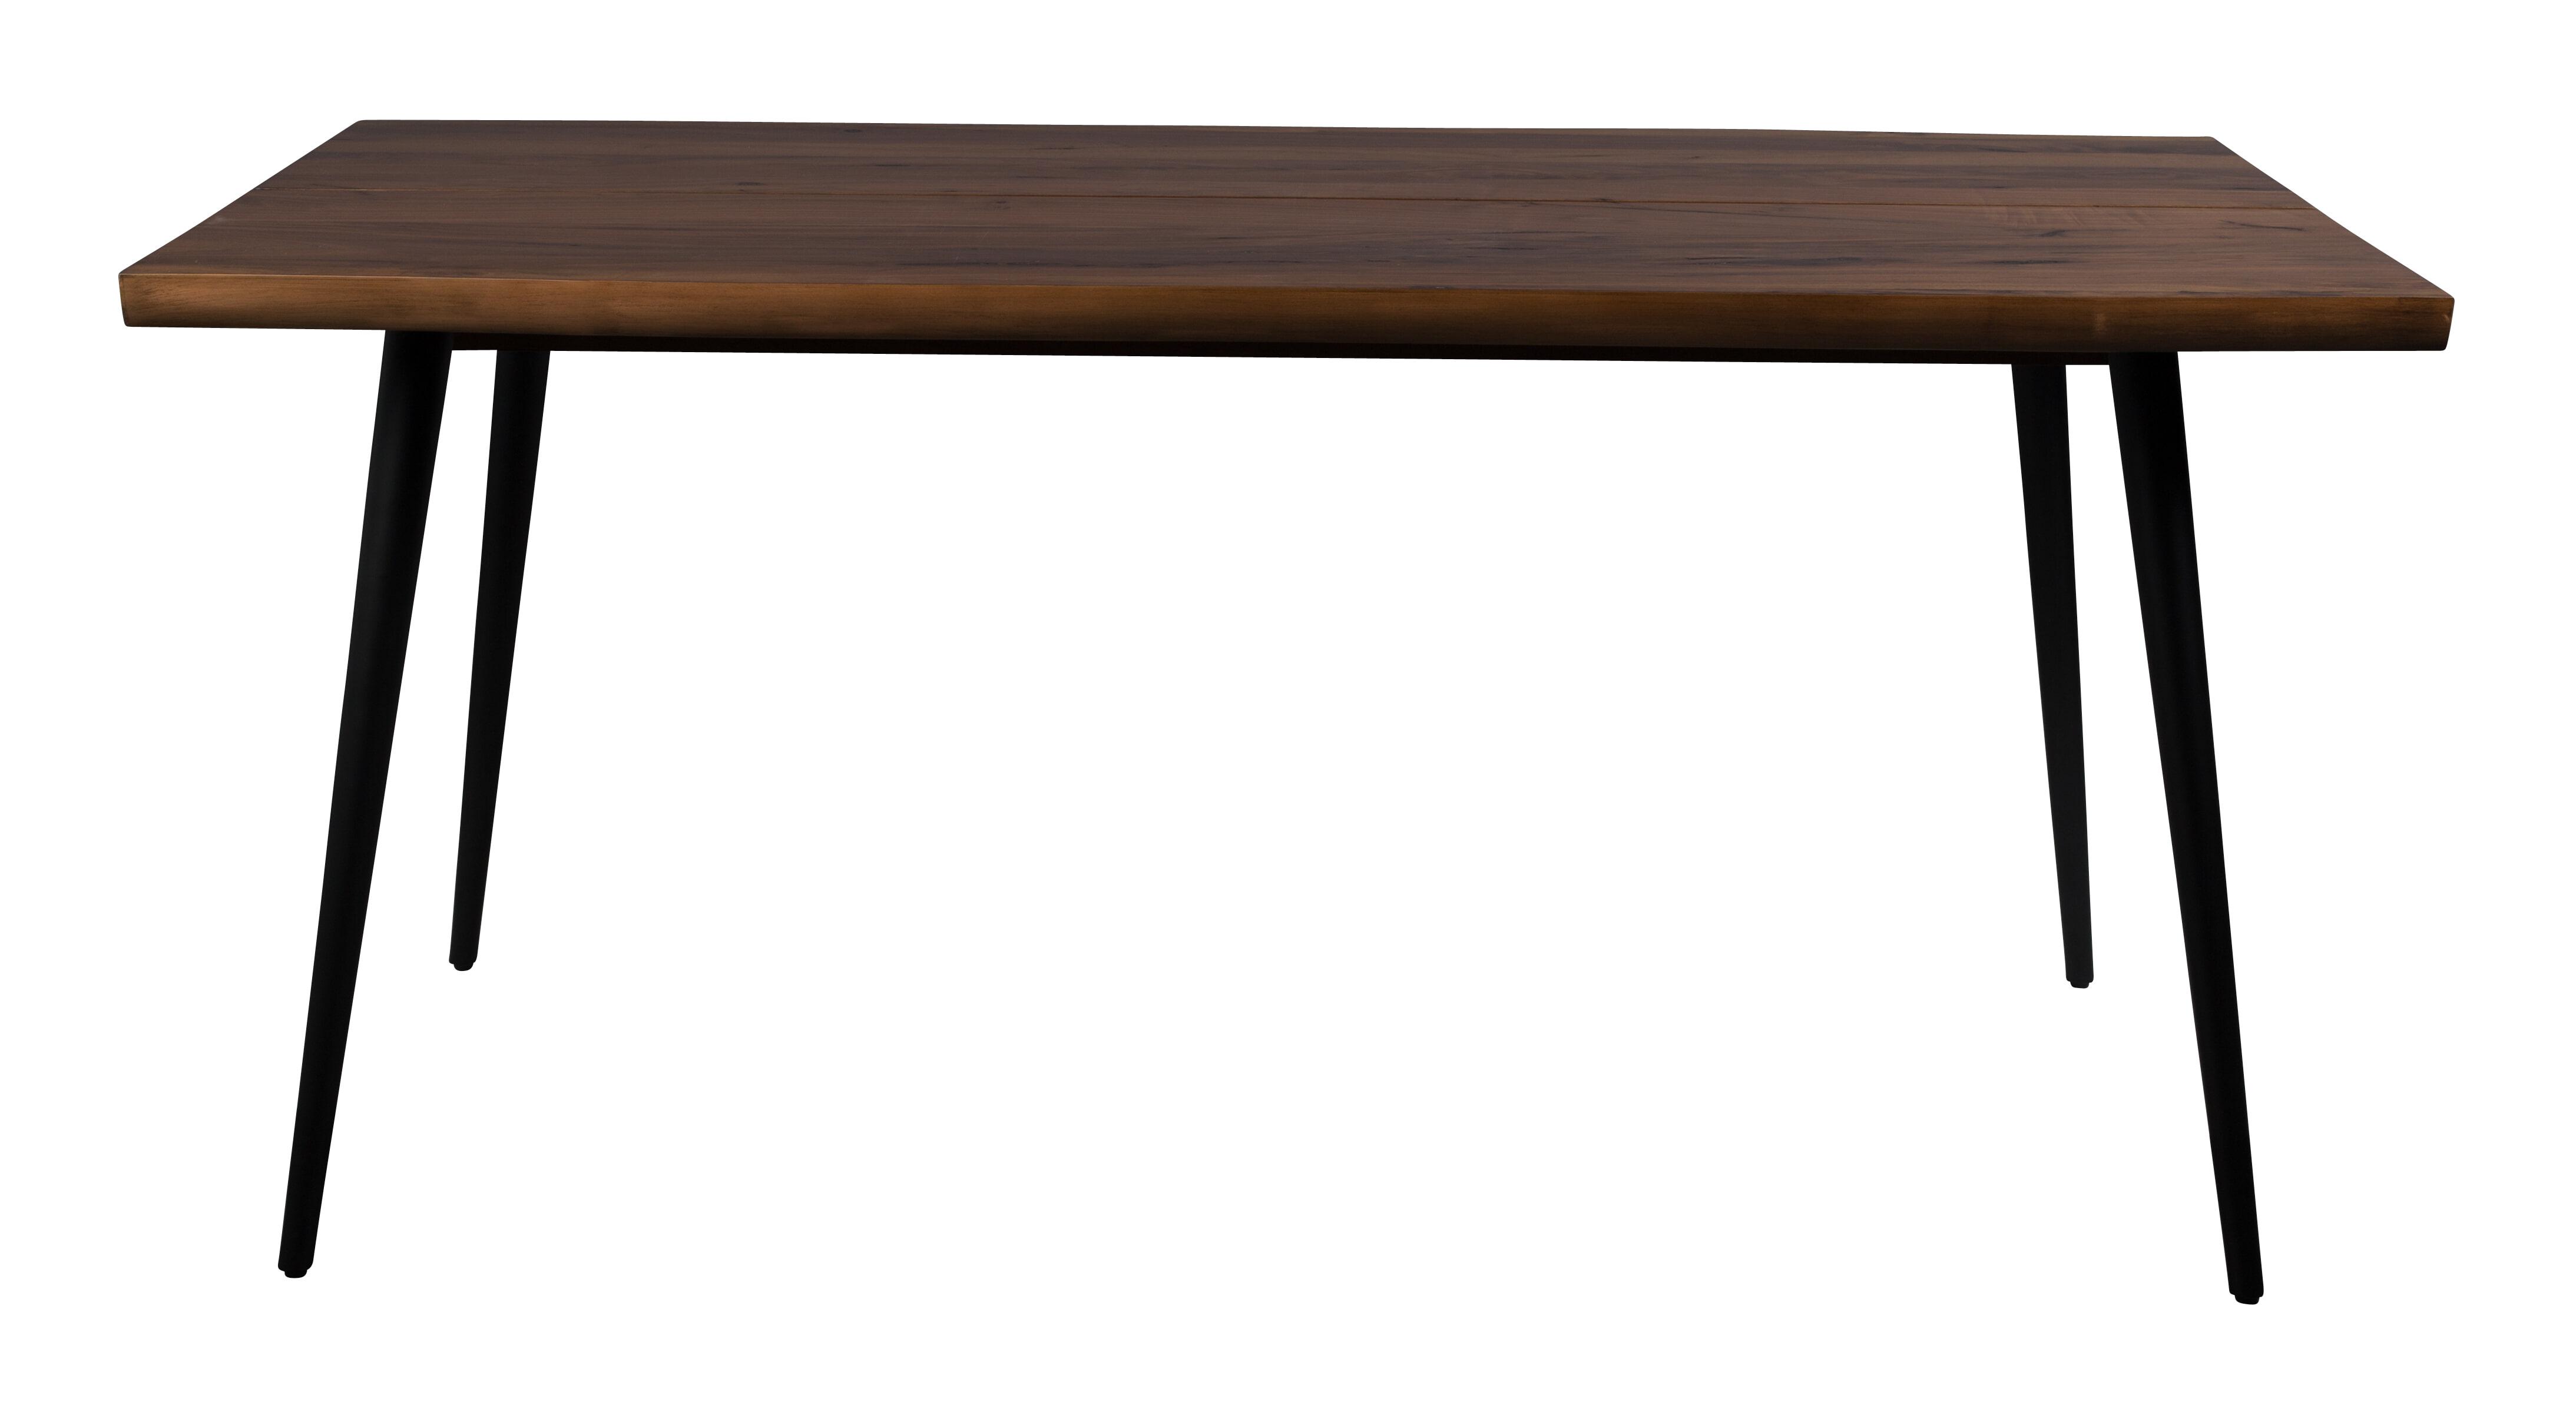 Dutchbone Eettafel 'Alagon' 160 x 90cm